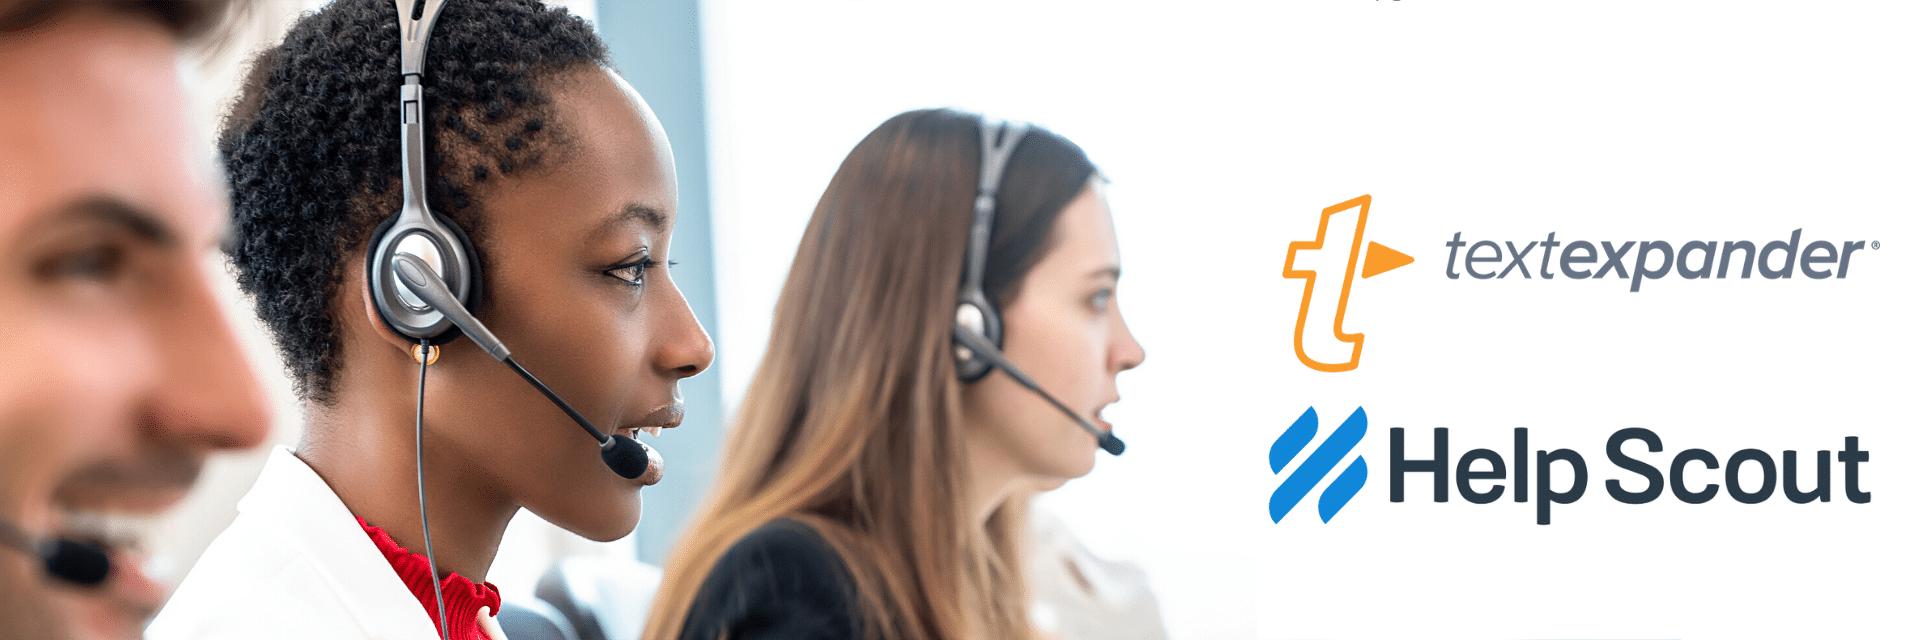 TextExpander and Help Scout Customer Support Webinar